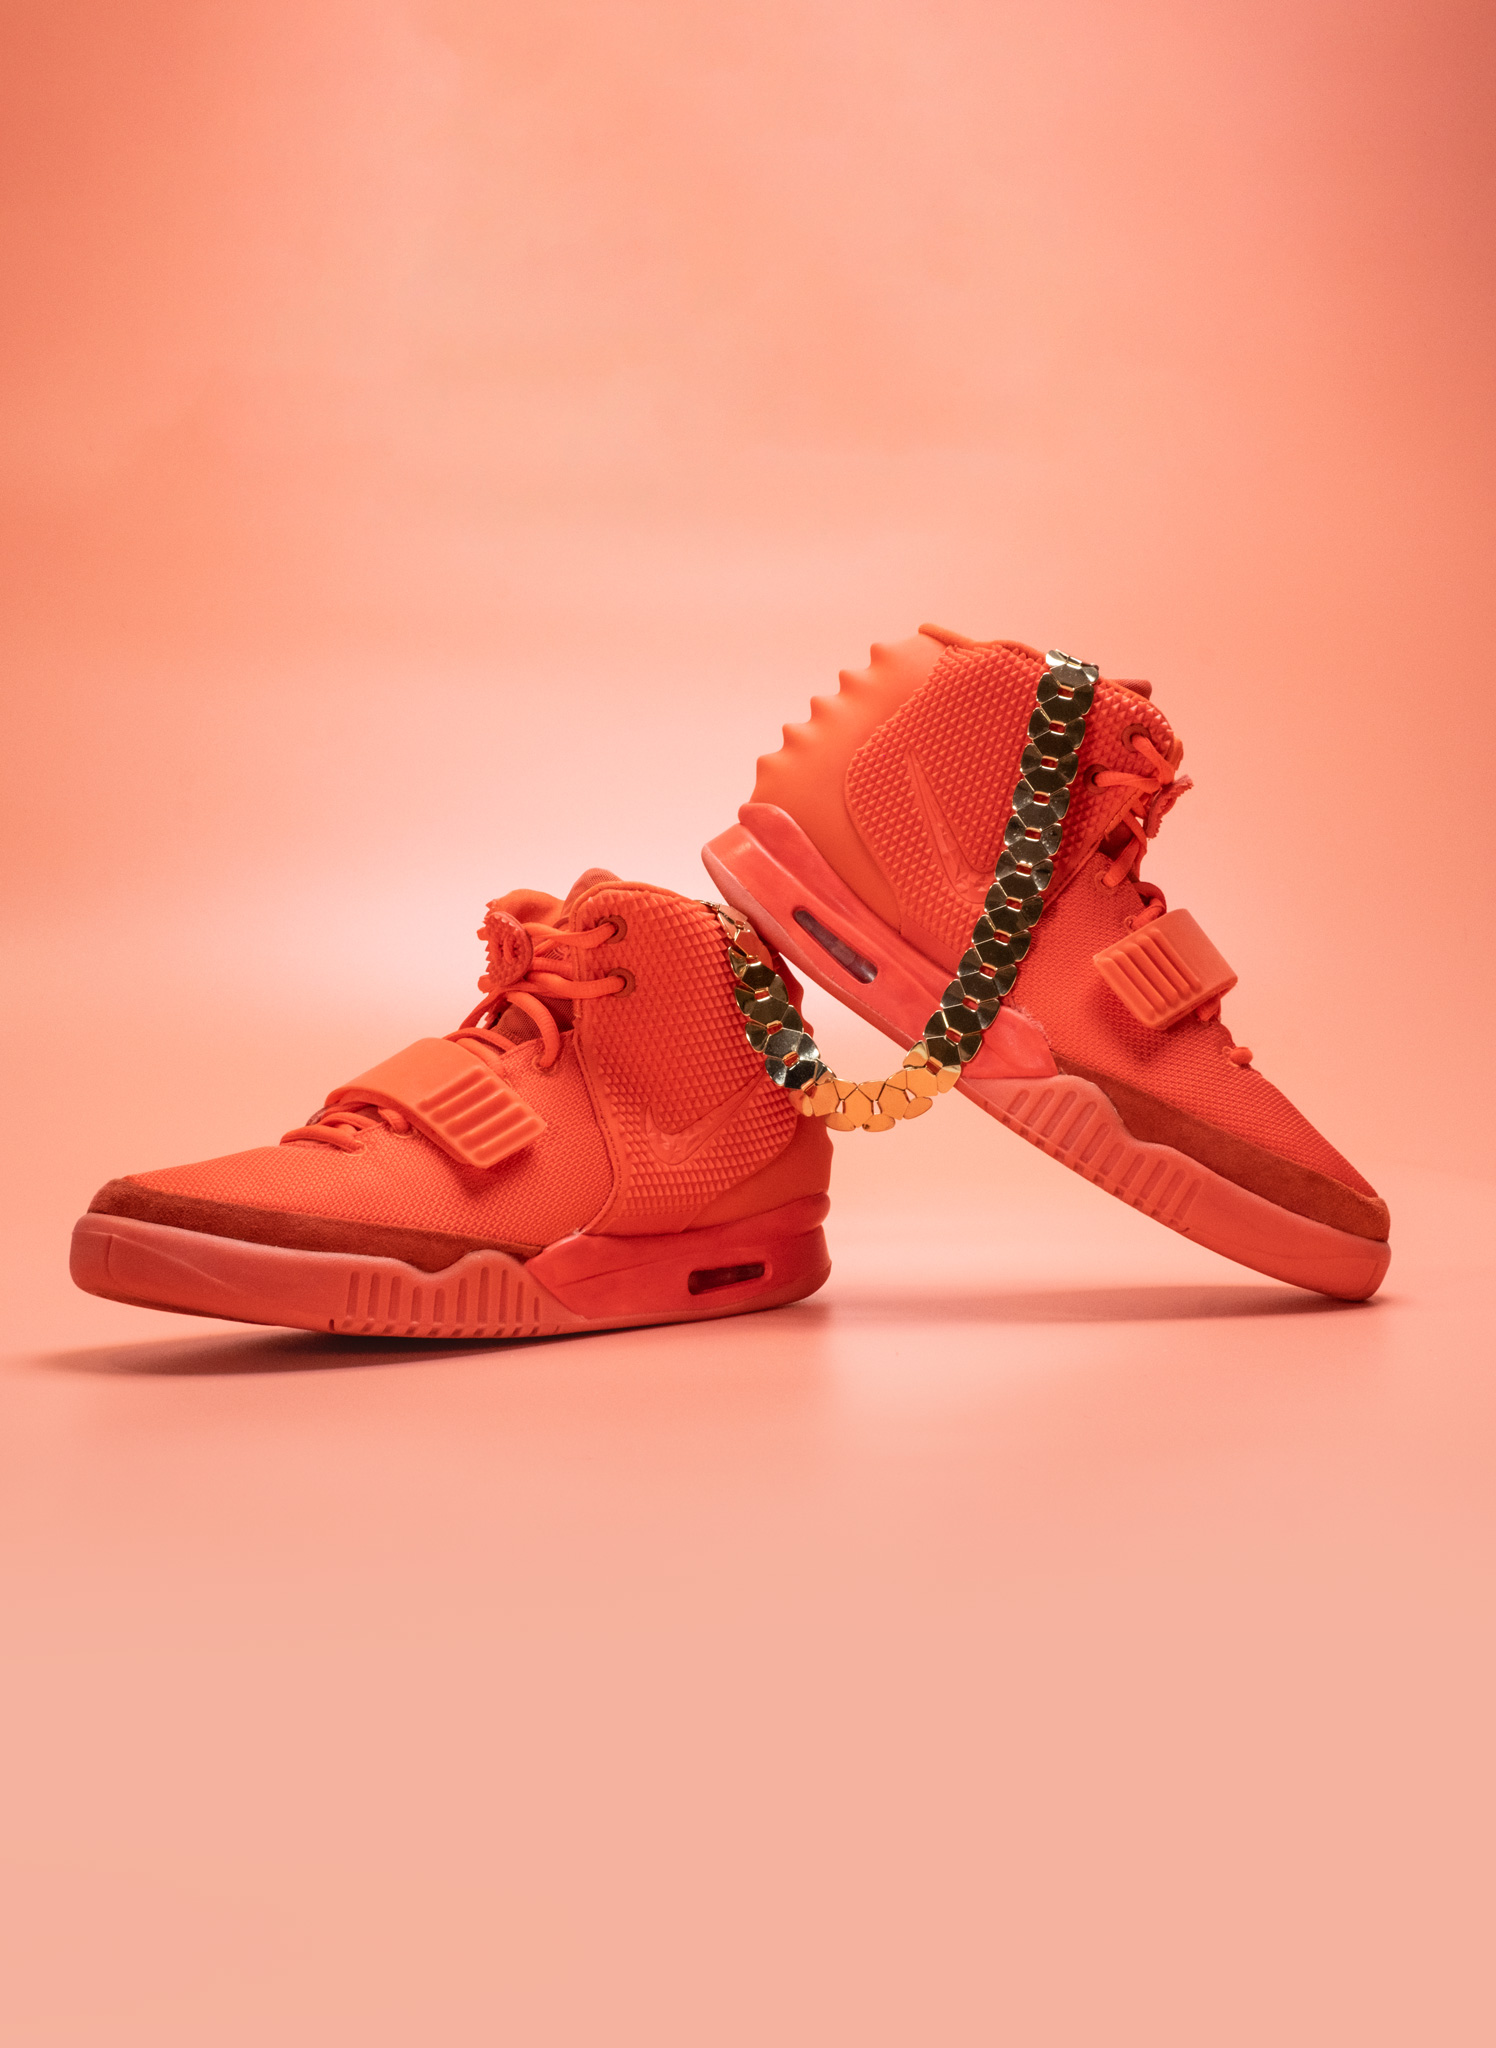 Nike Air Yeezy 2 Red October Mood 2